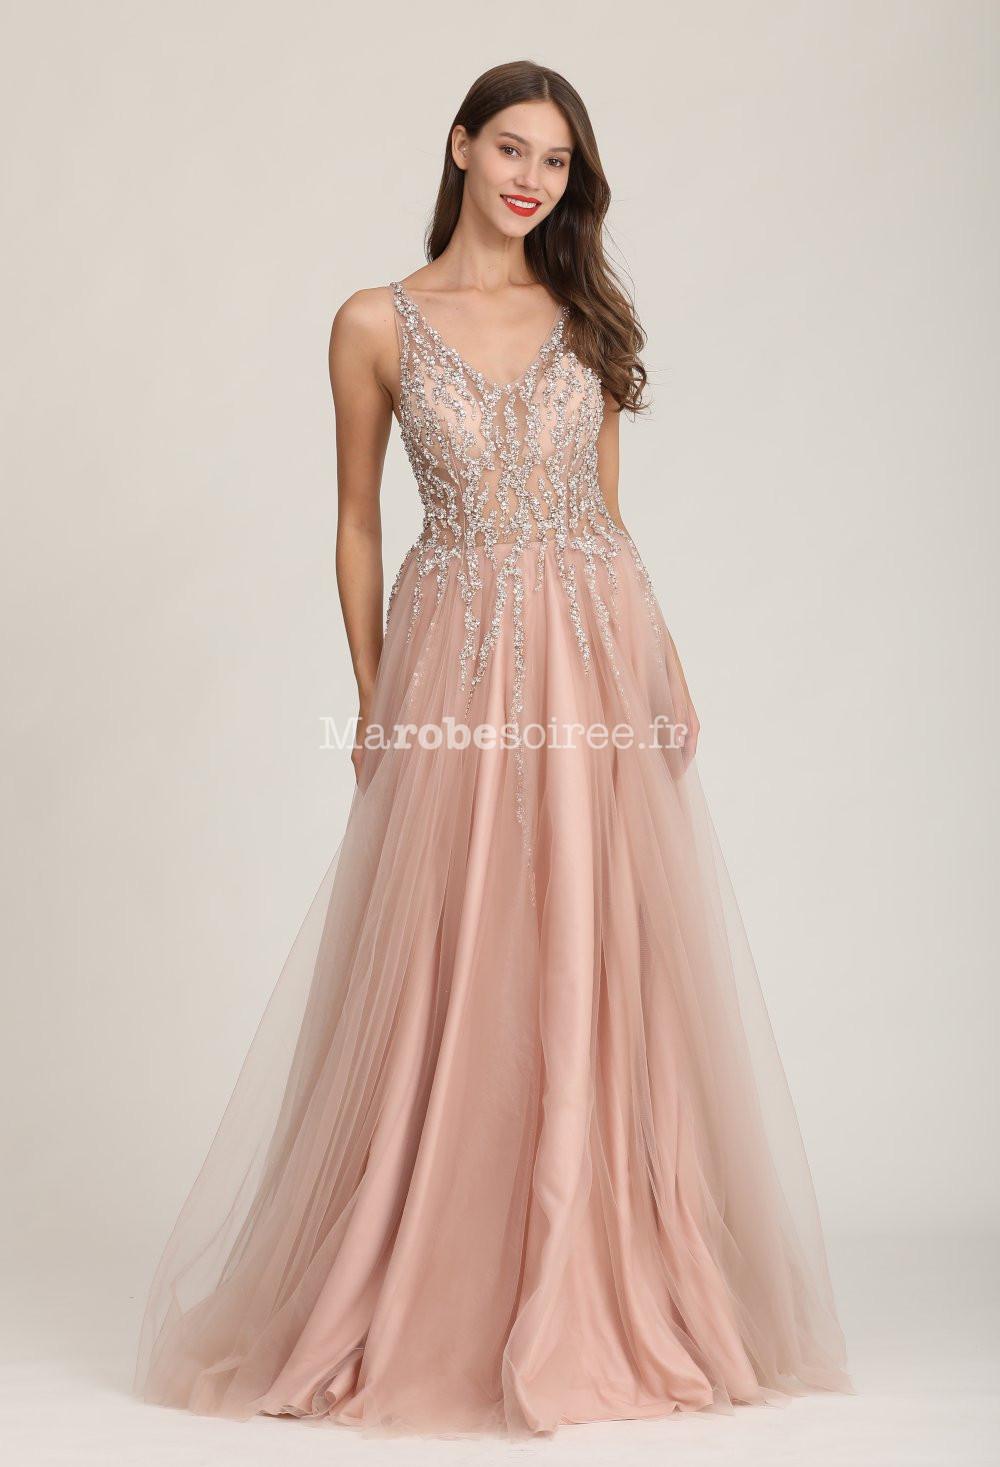 Robe de soirée rose princesse